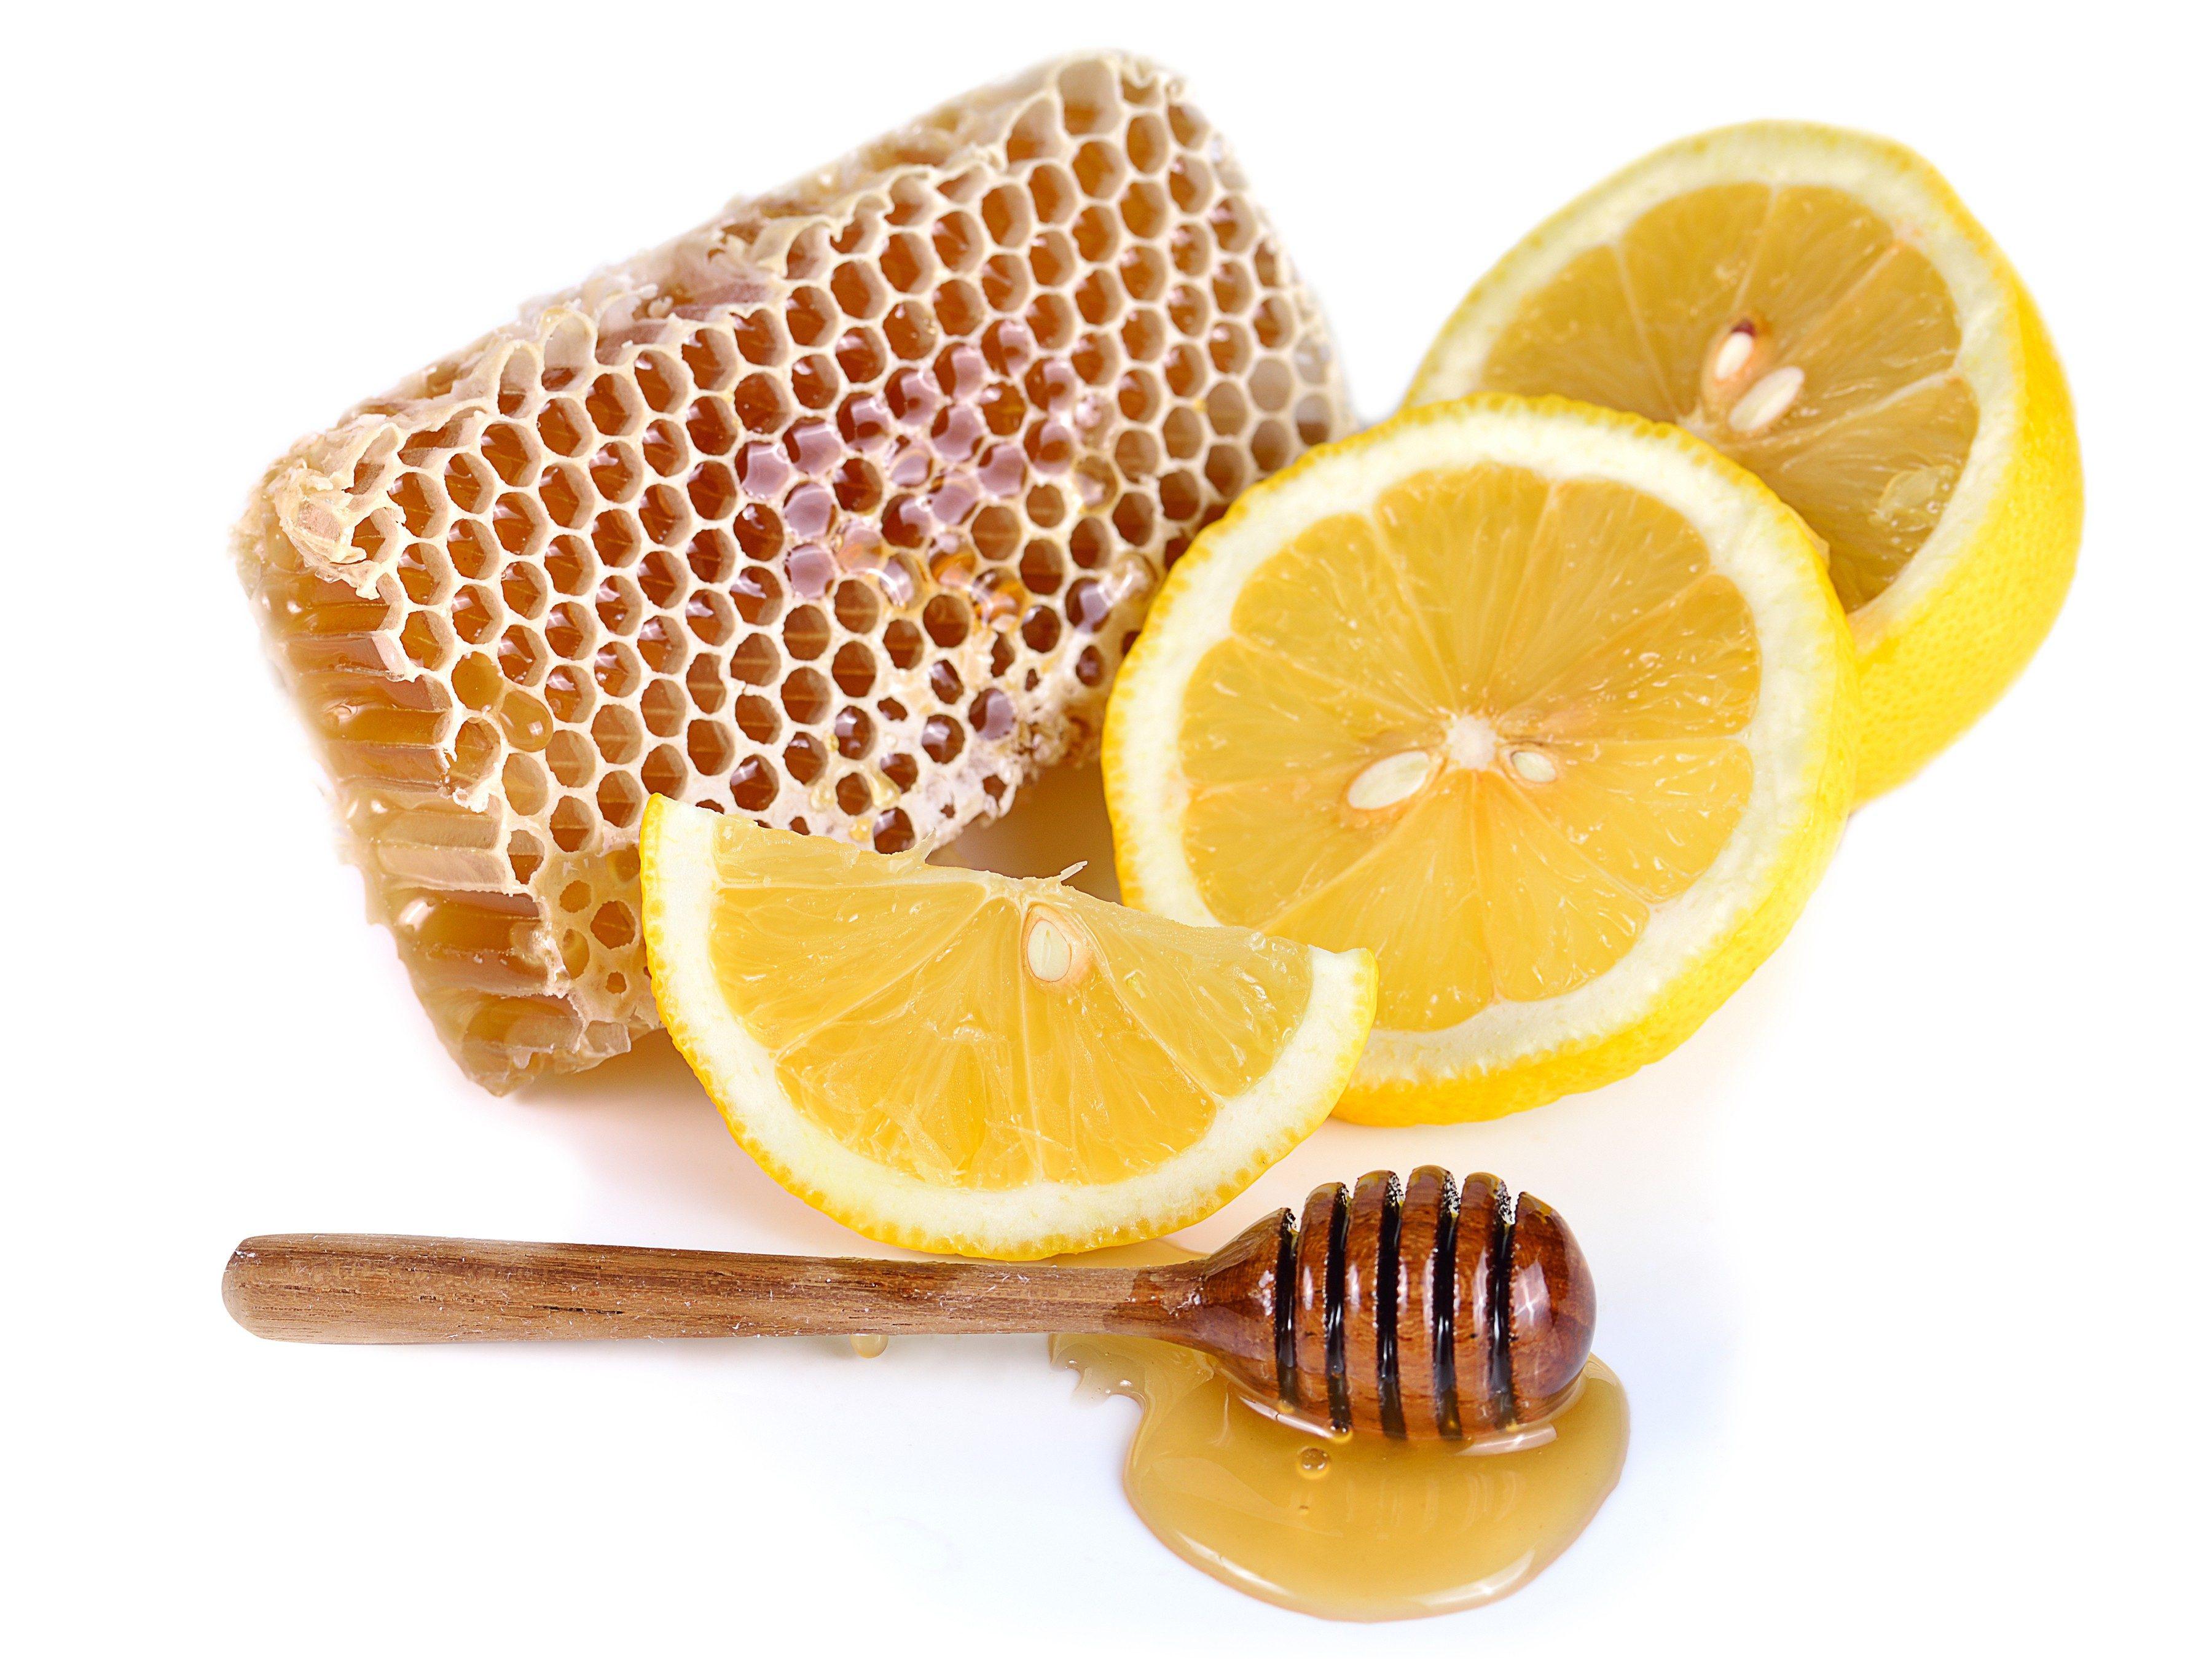 7. Lemon and honey